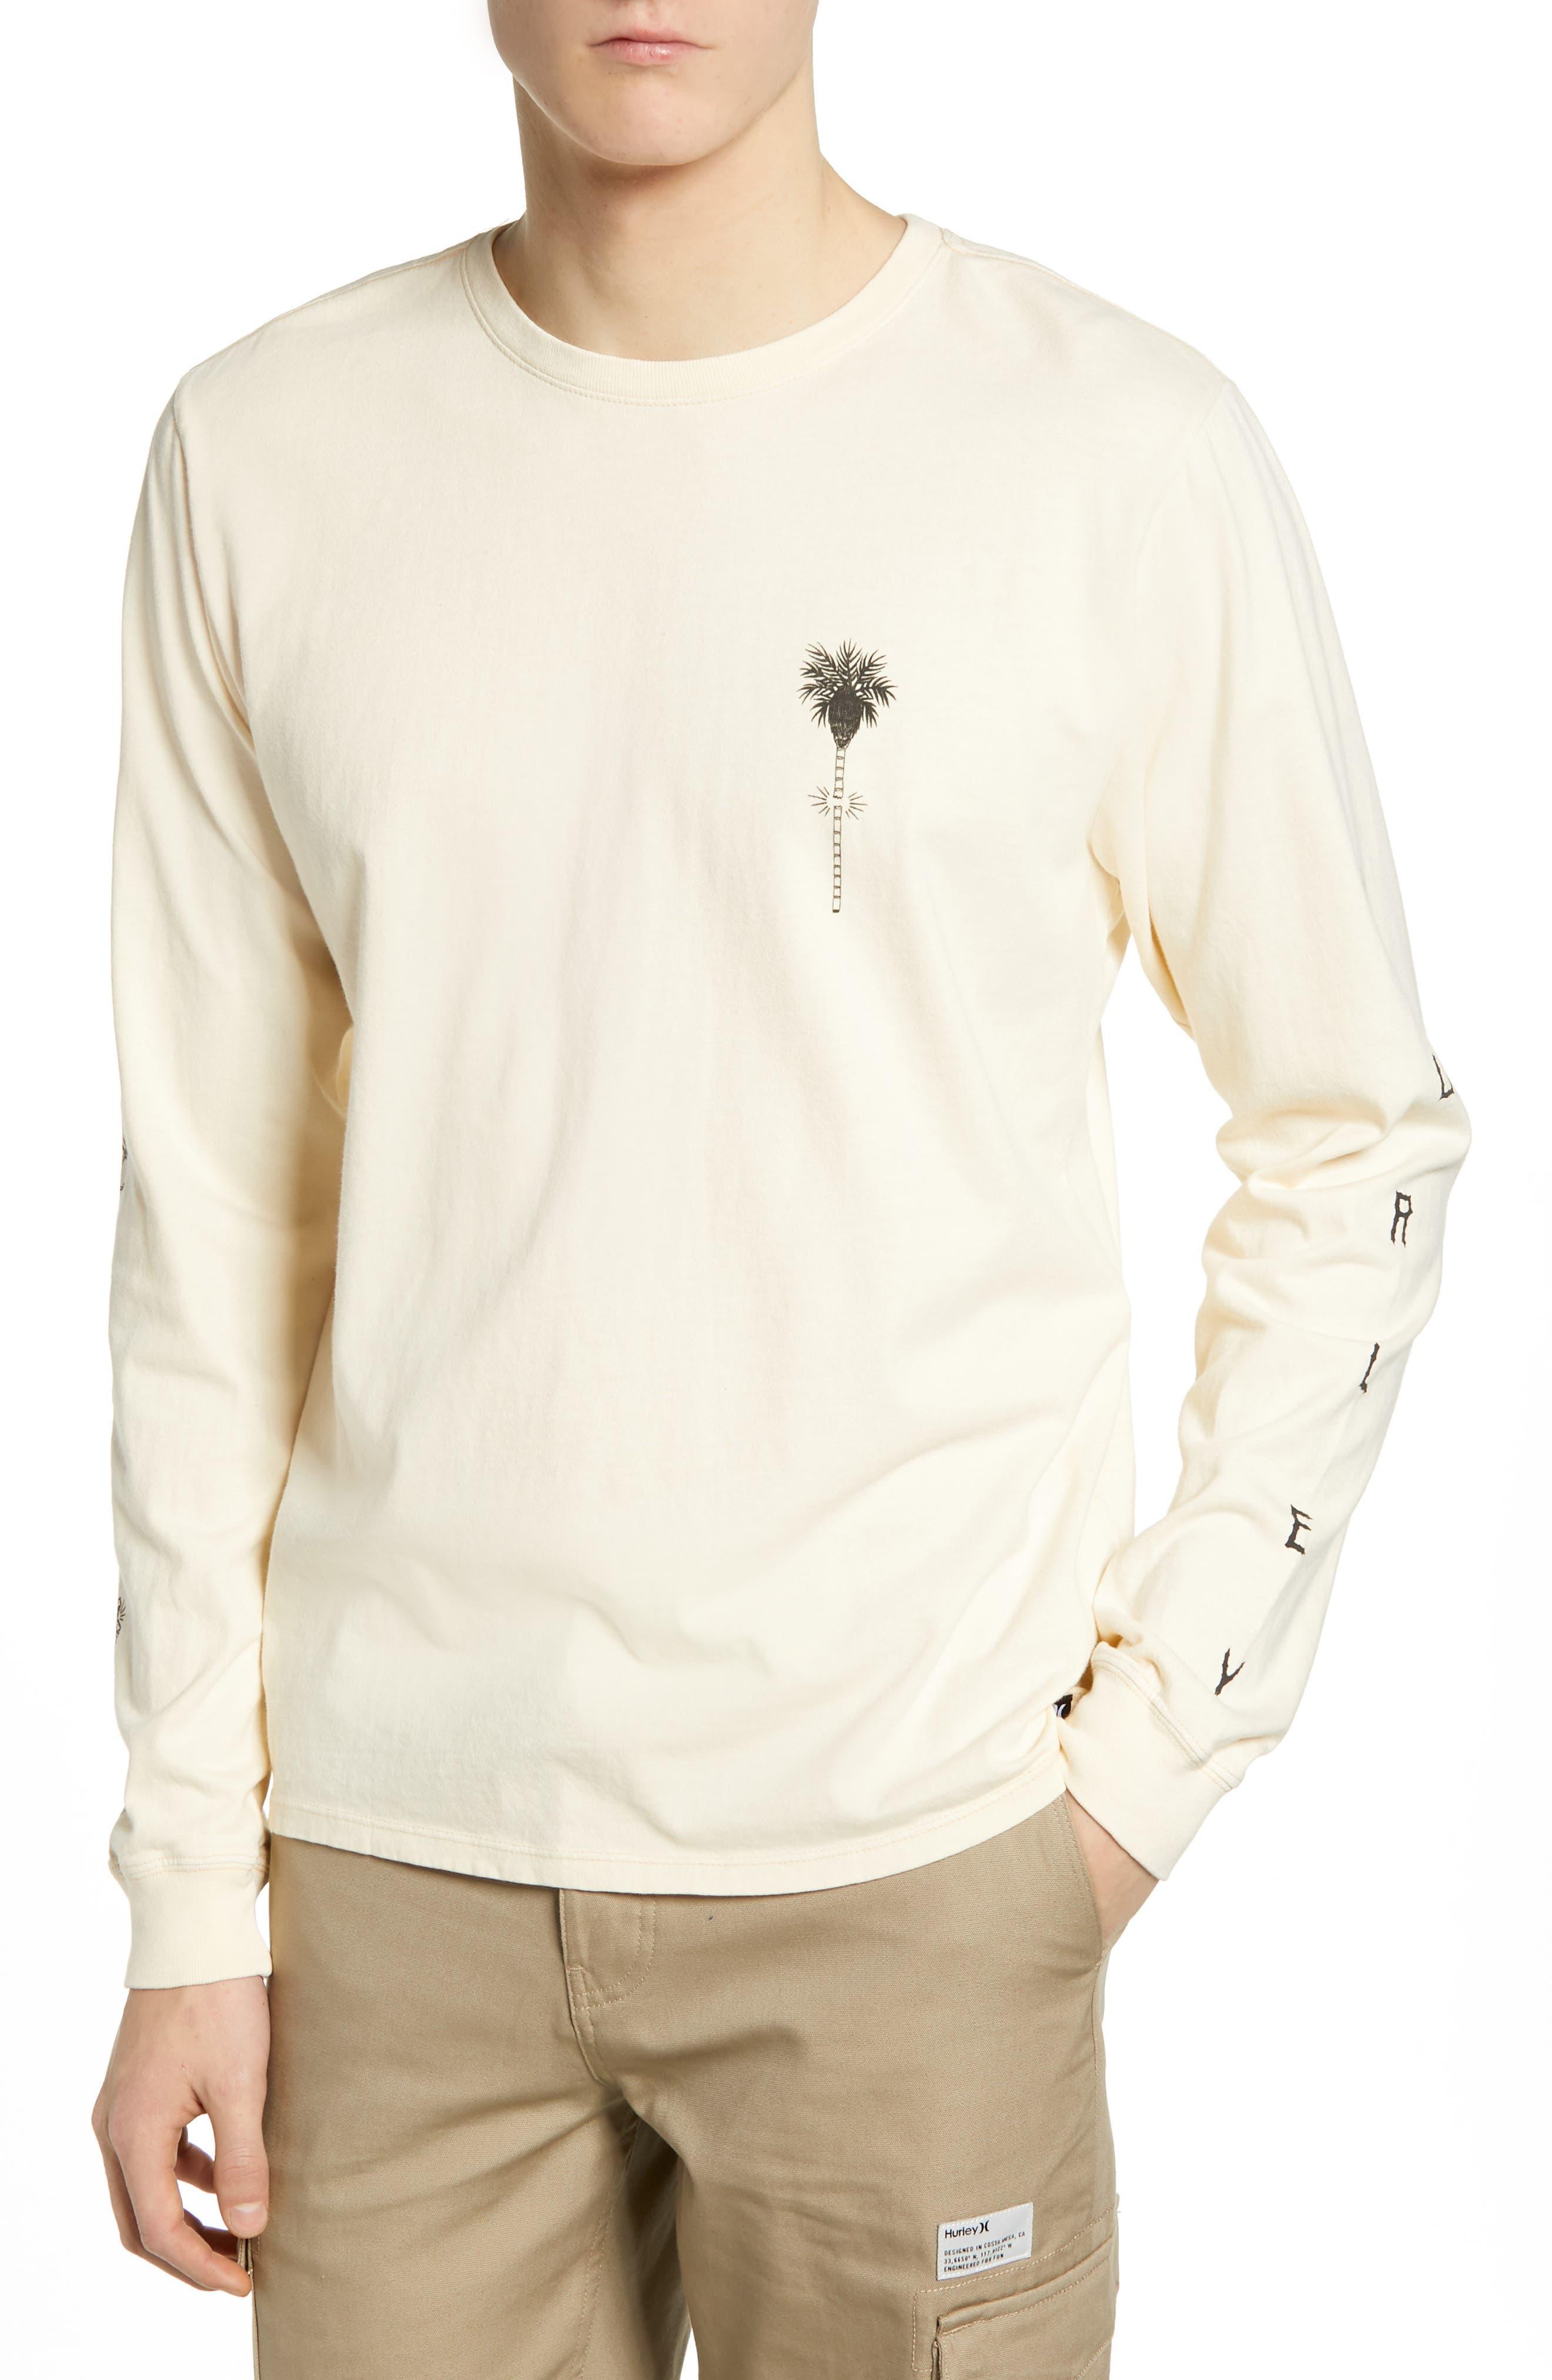 HURLEY Heavy Shred Long Sleeve T-Shirt in Light Cream